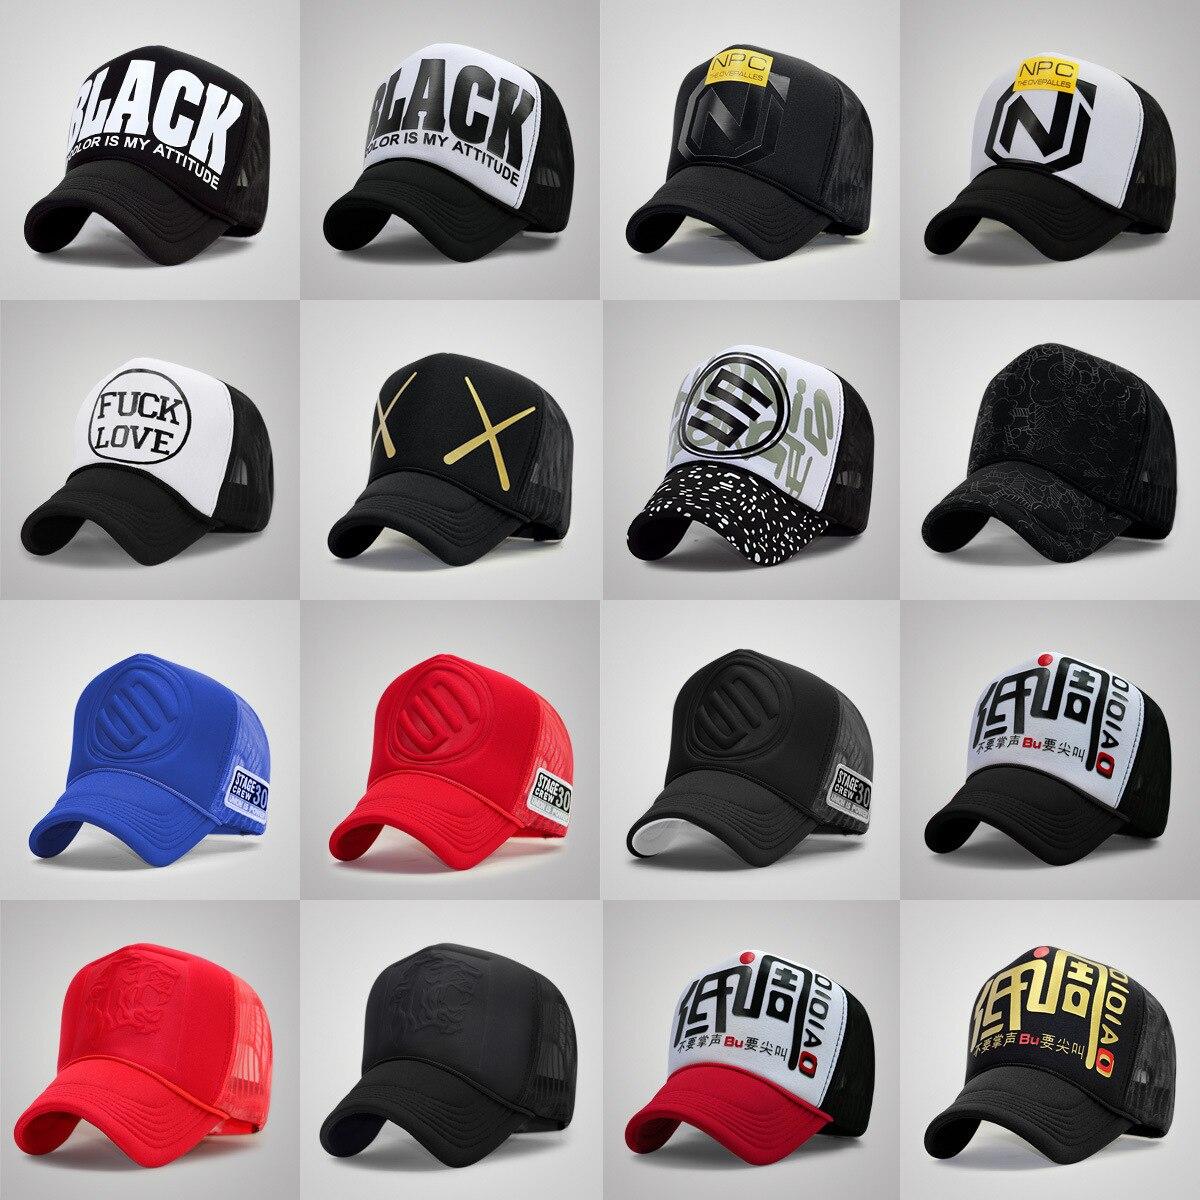 Wholesale Adult Trucker Cap Men And Women Hiphop Punk Rock Snapback Hats Male Summer Sunshade Mesh Baseball Hat 60 Colors